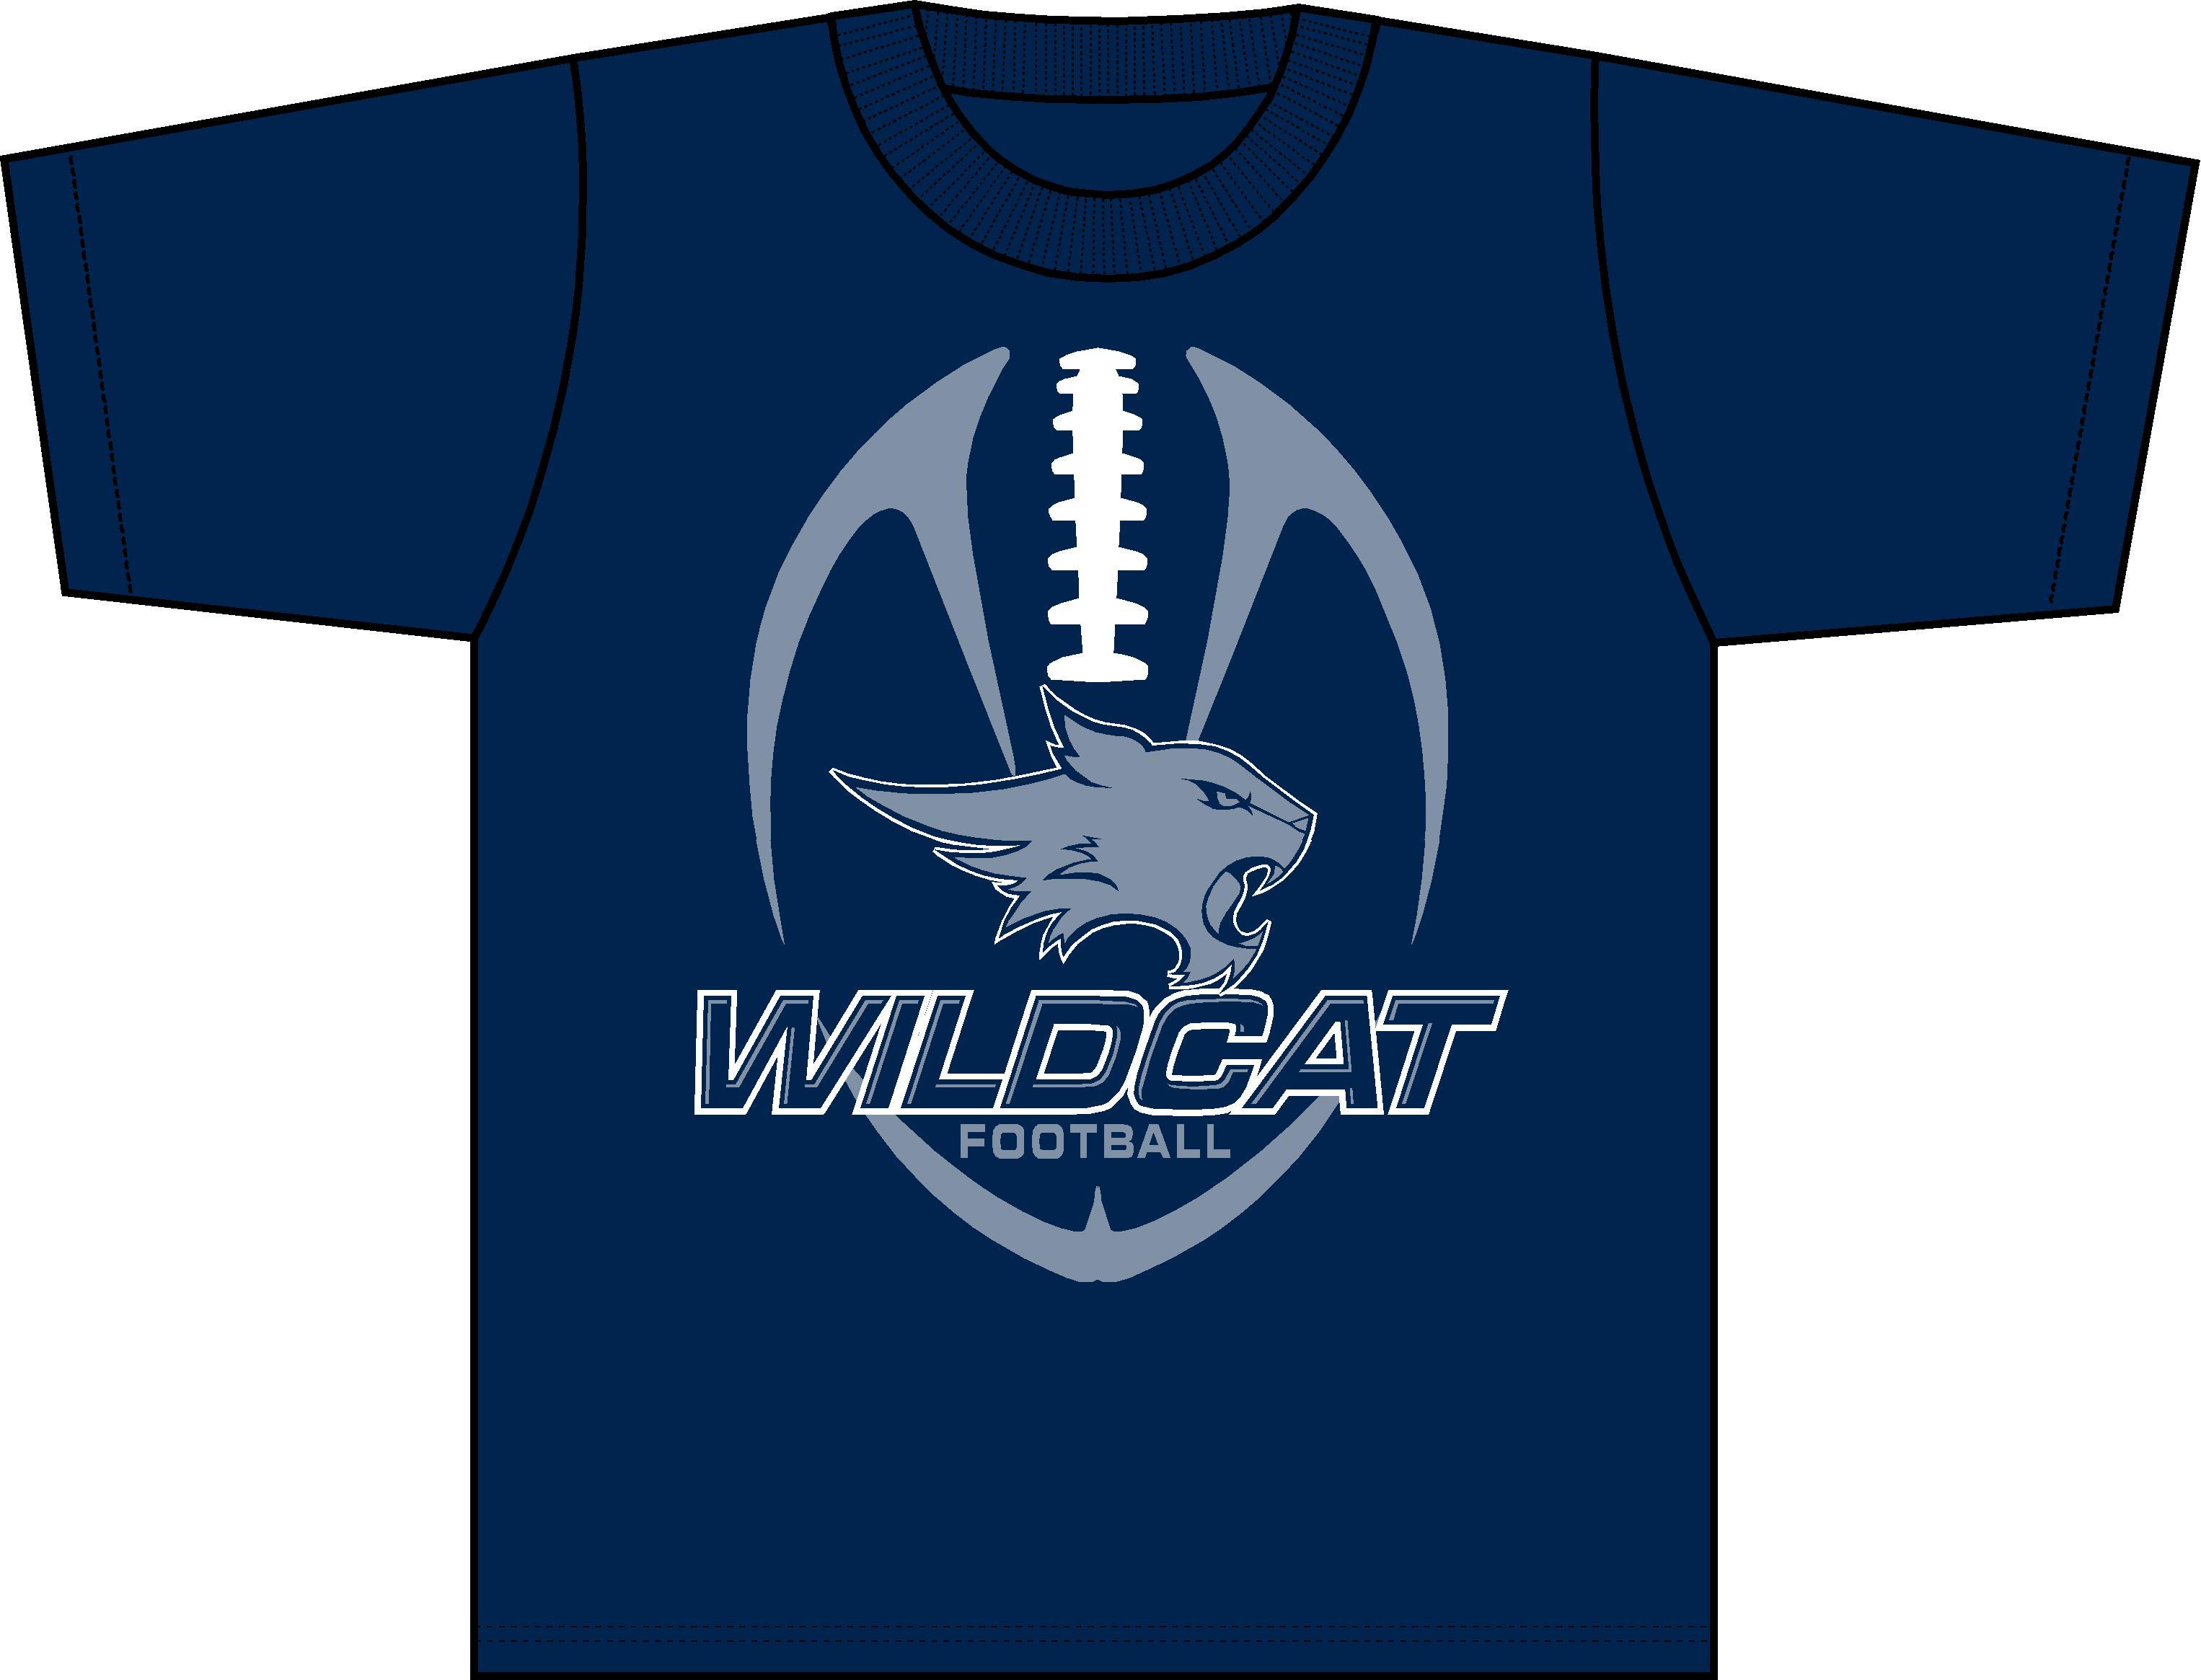 wildcat-football-12.jpg